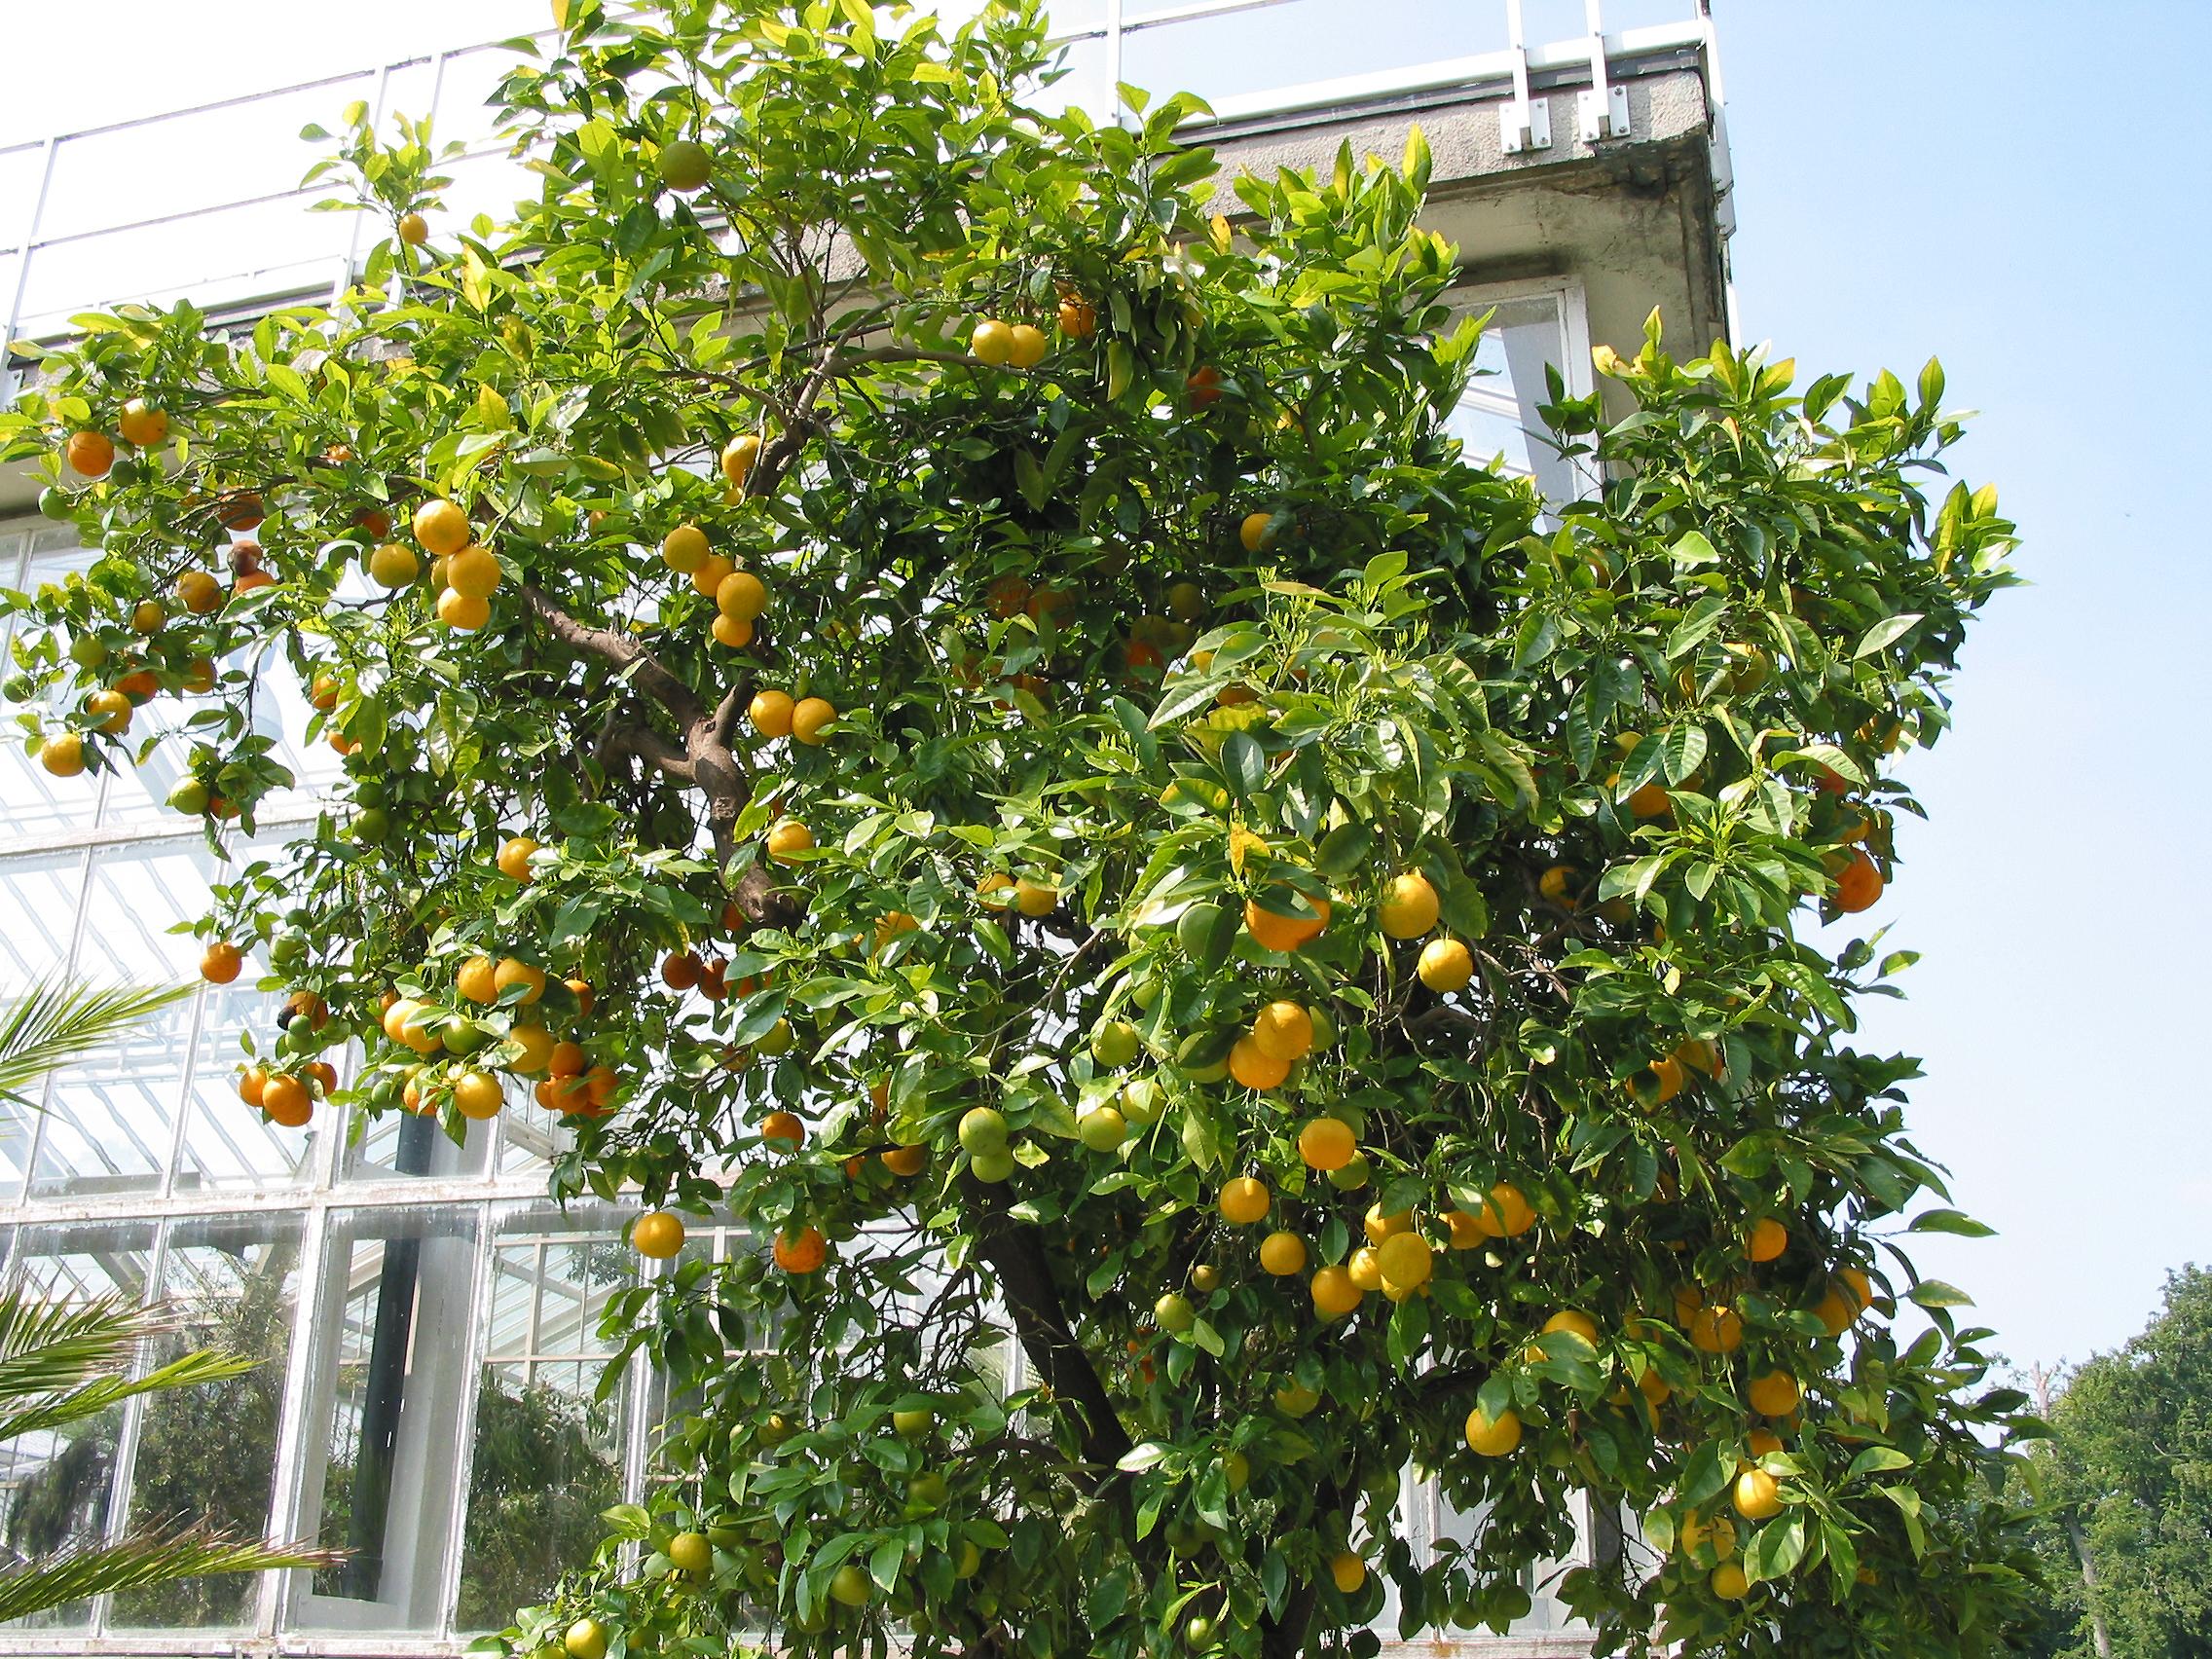 Citrus Sinensis Distribution File:citrus Sinensis Jpg01.jpg